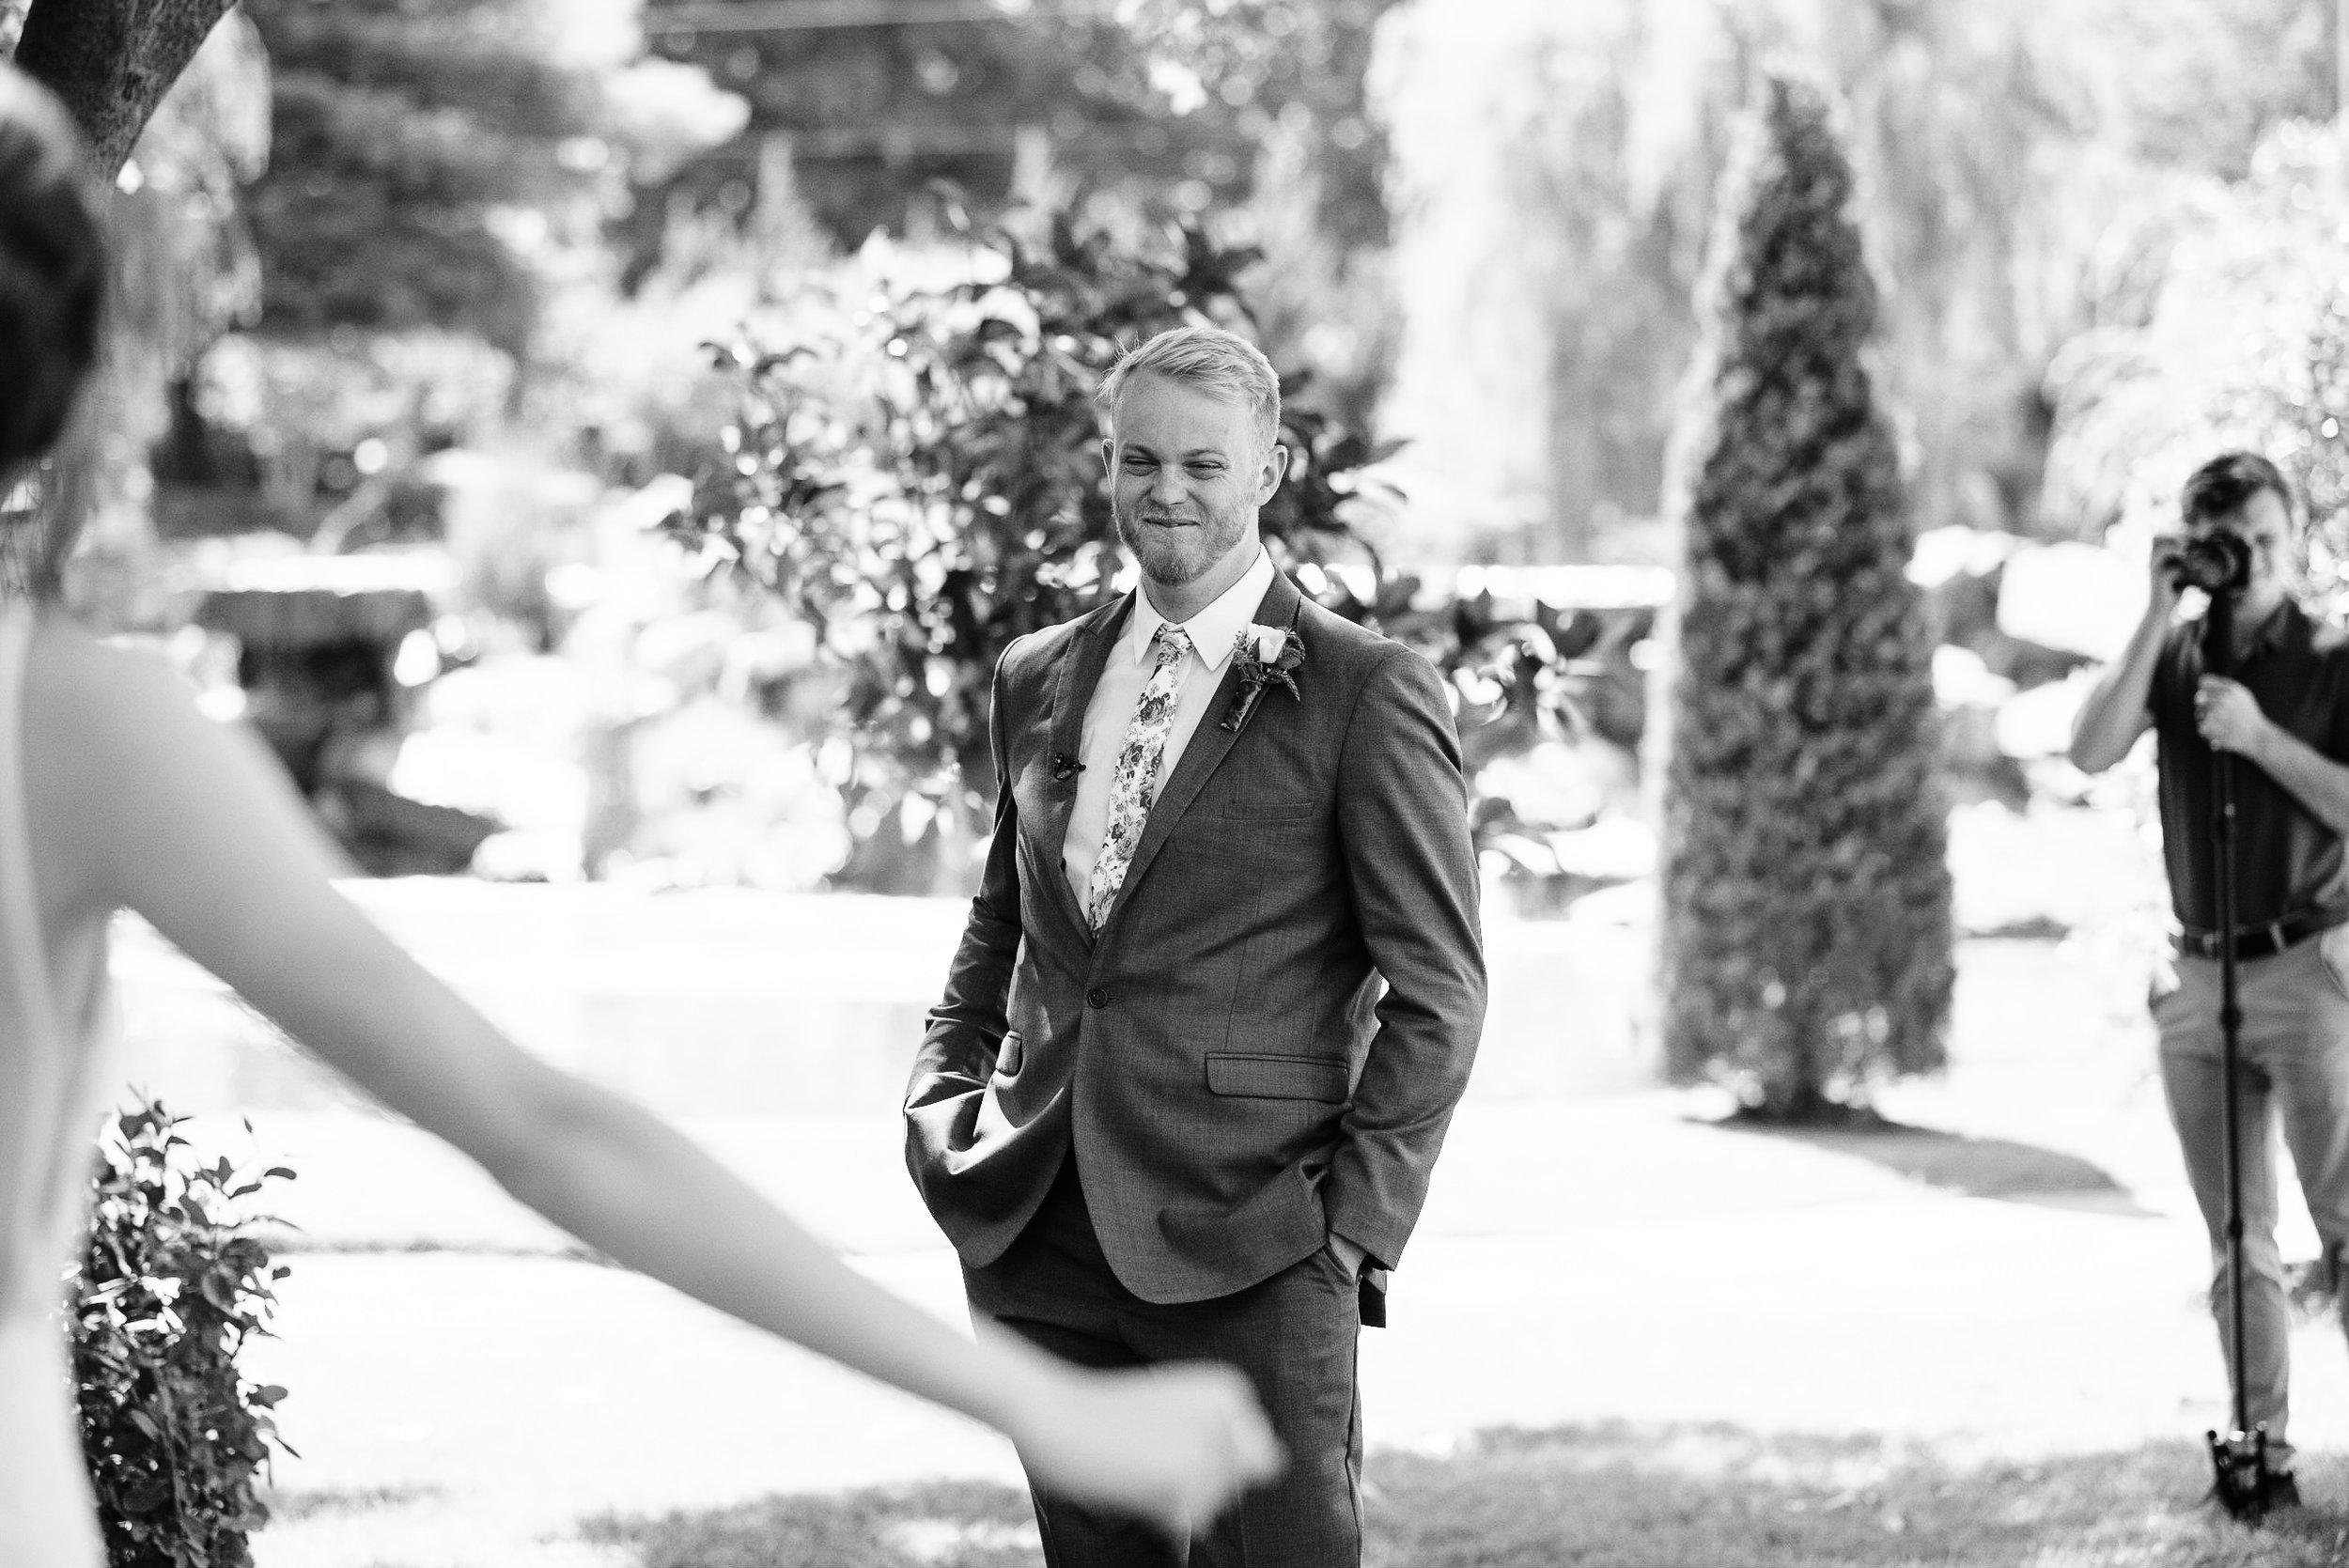 okc-wedding-photographer-coles-garden-wedding-okc-best-wedding-photographers-39.jpg